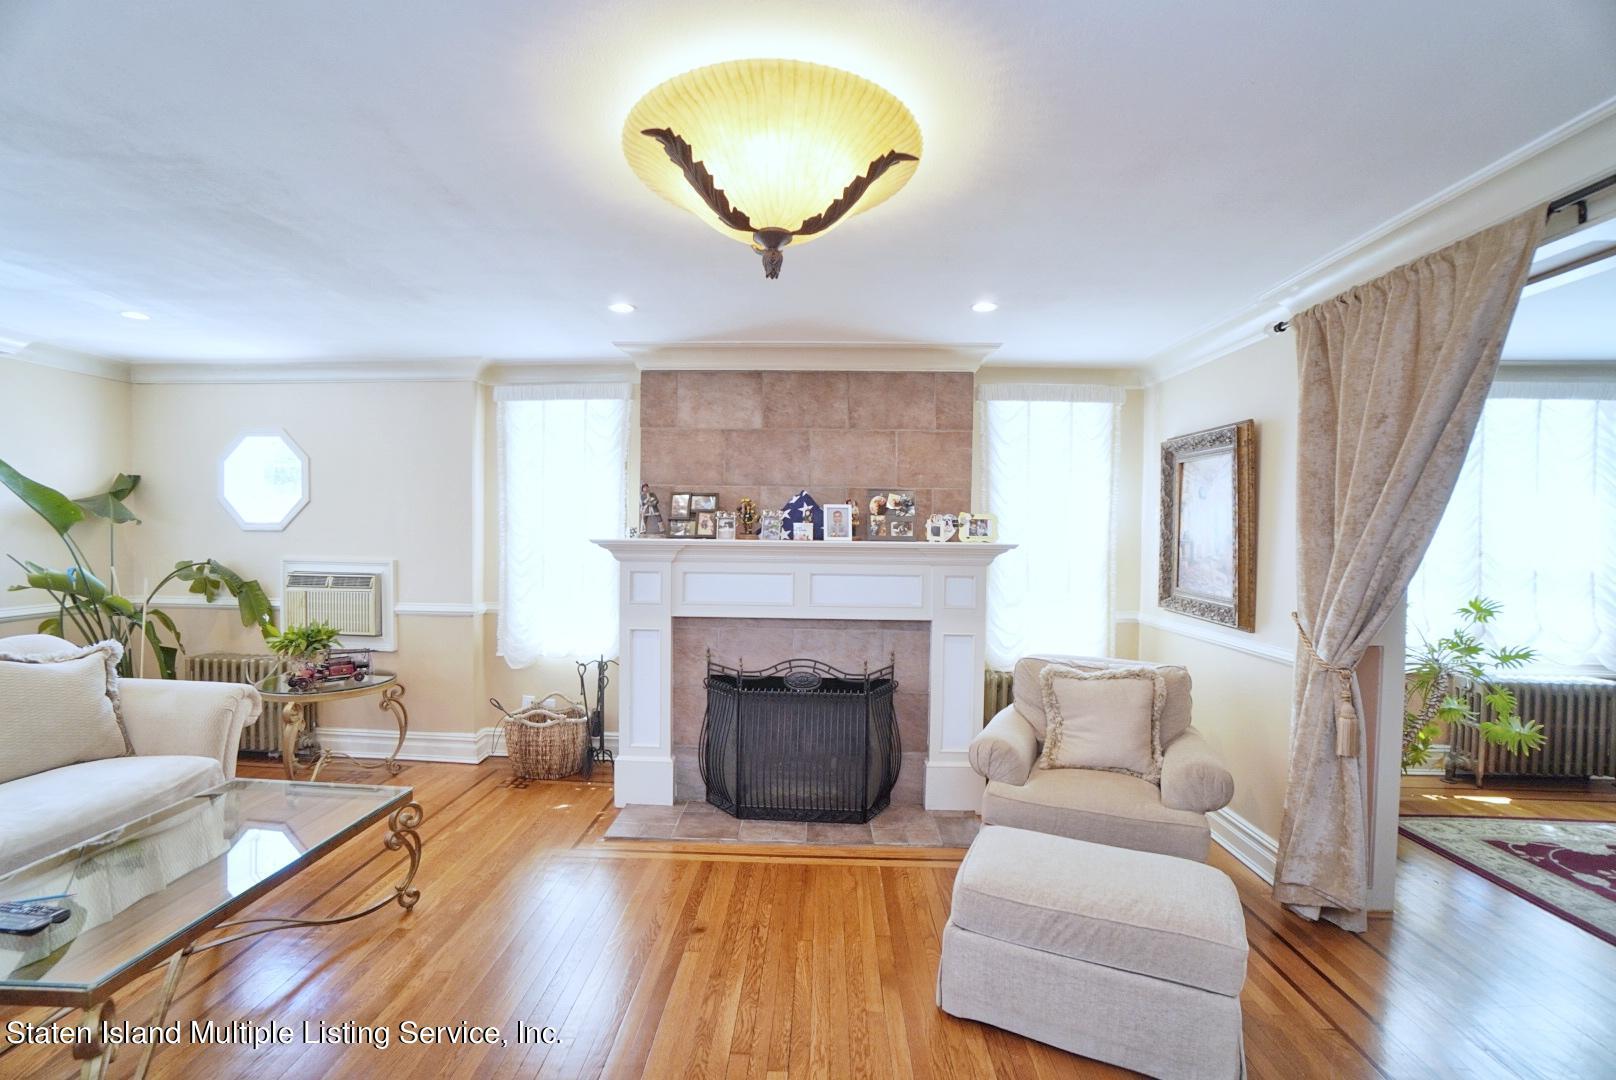 Single Family - Detached 264 Fisher Avenue  Staten Island, NY 10307, MLS-1146898-10